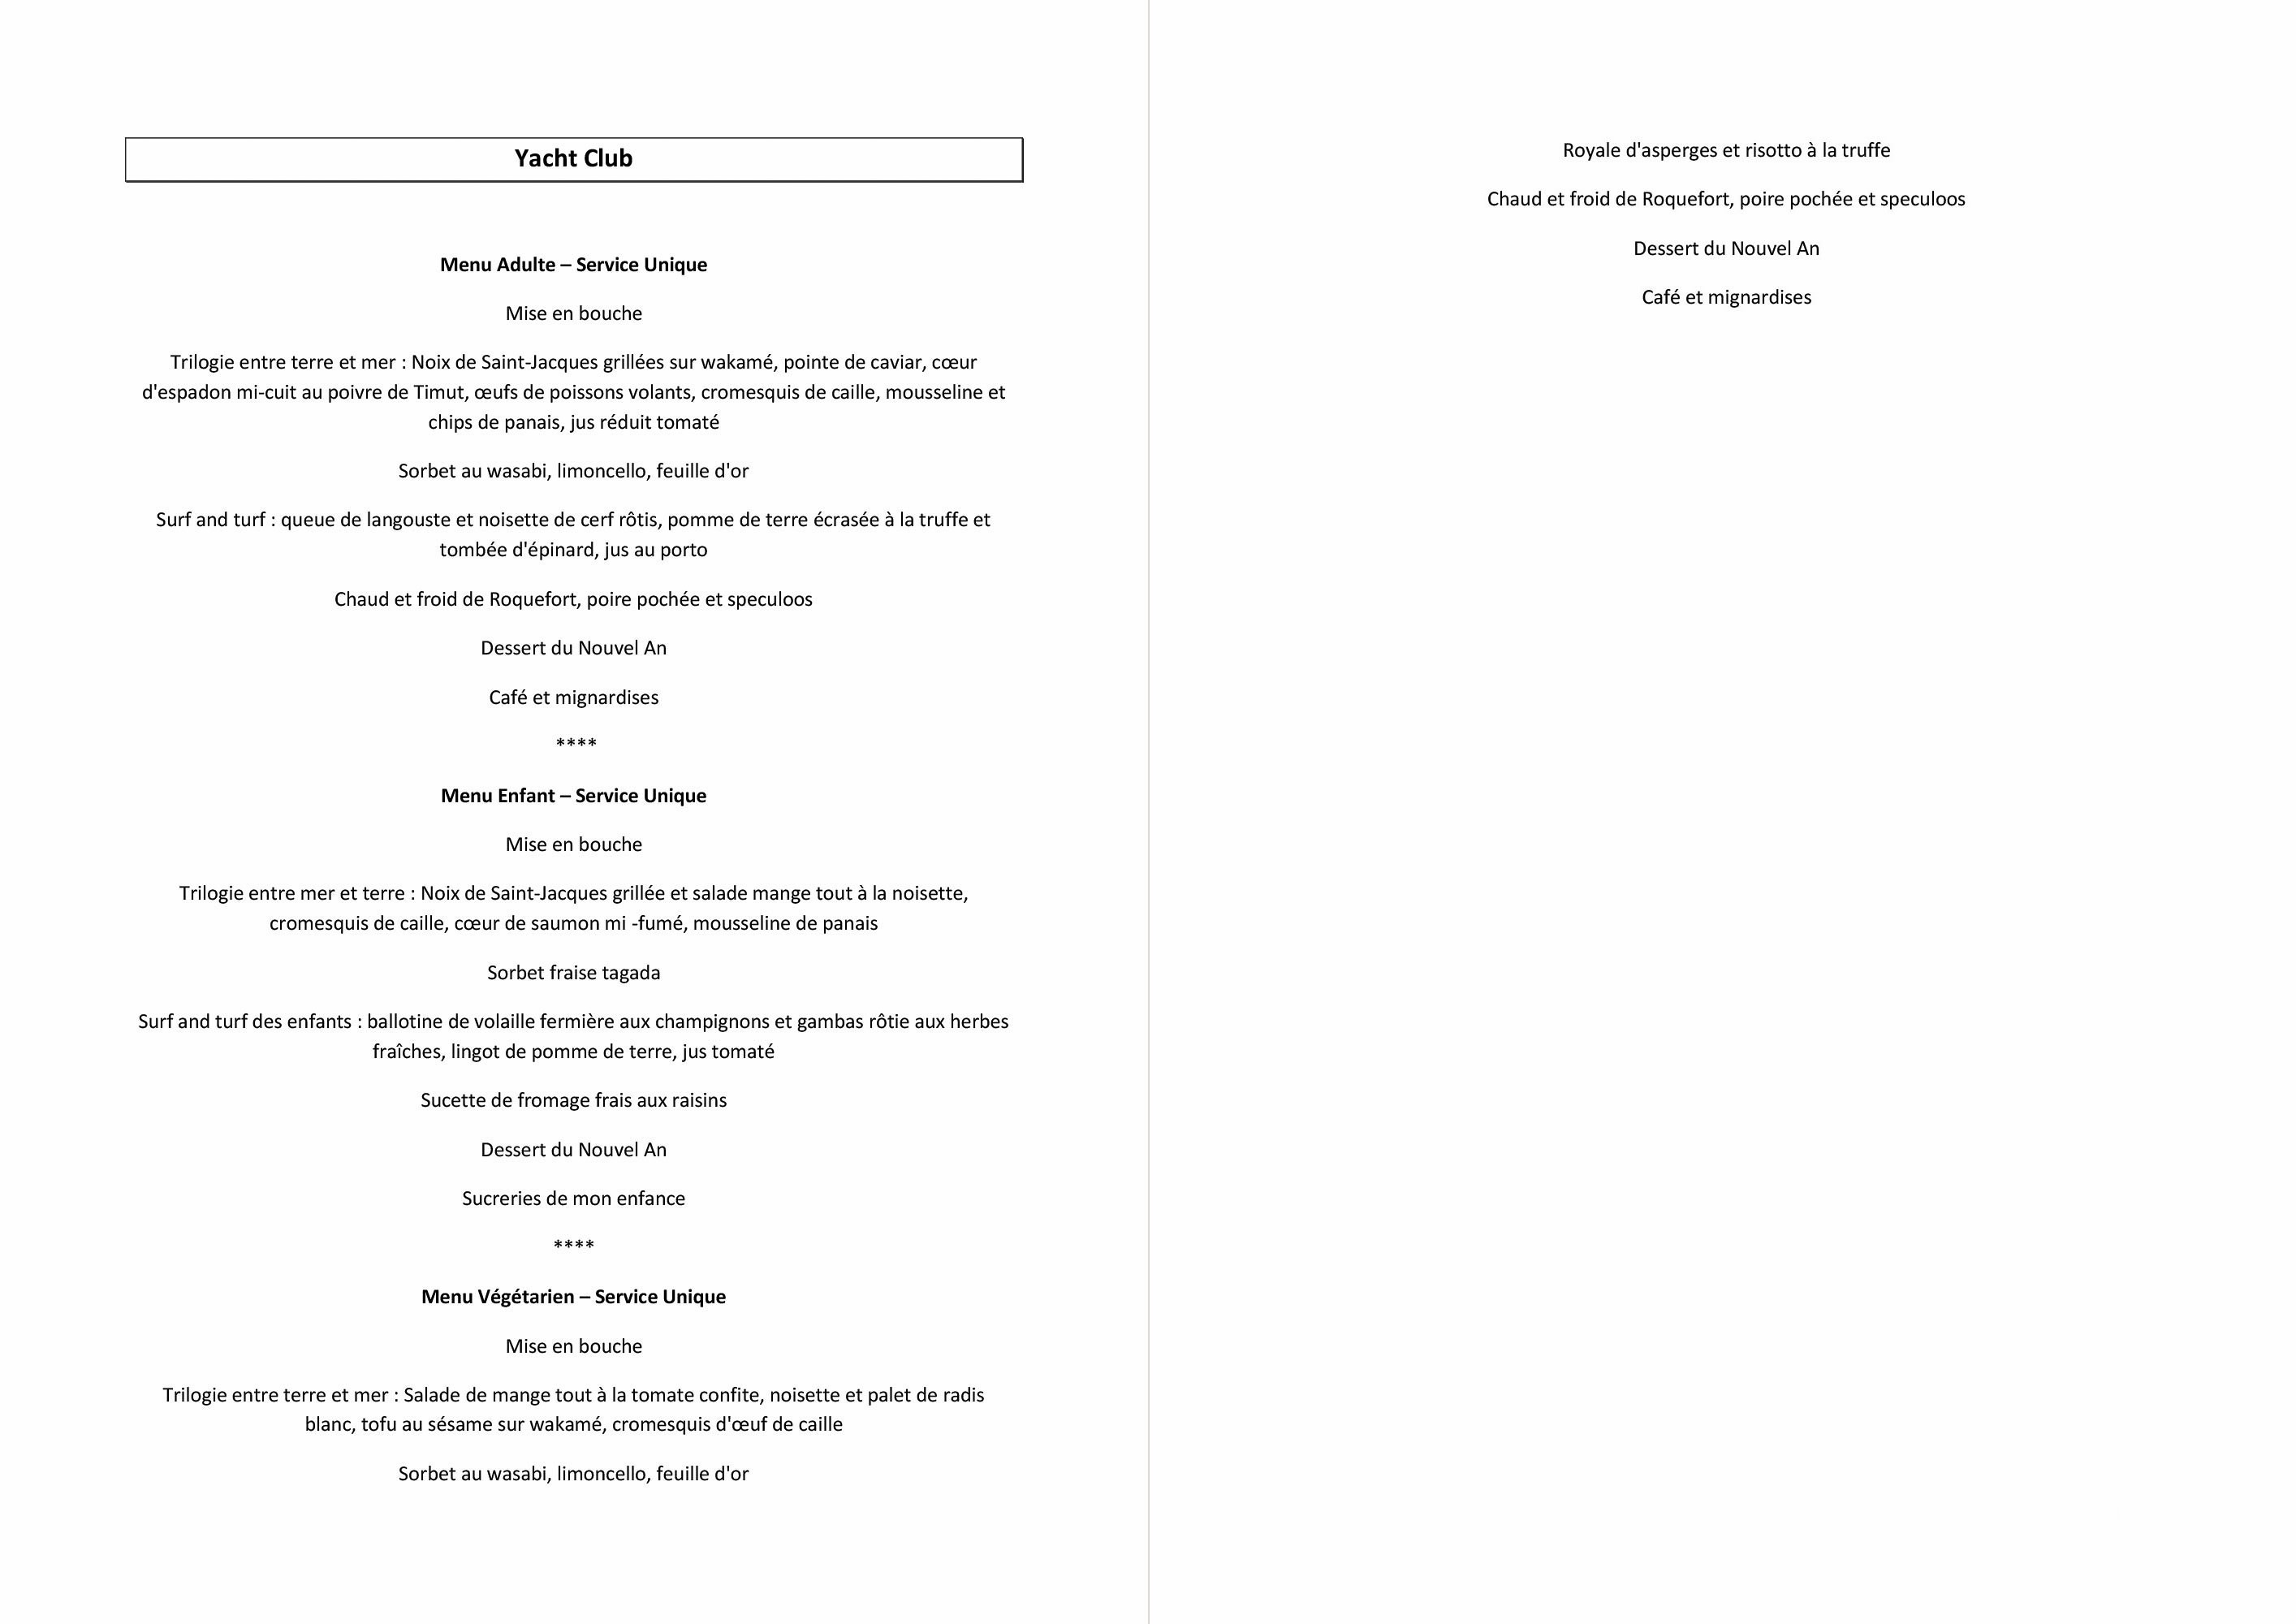 menu-reveillon-nouvel-an-2016-disneyland-paris-yacht-club